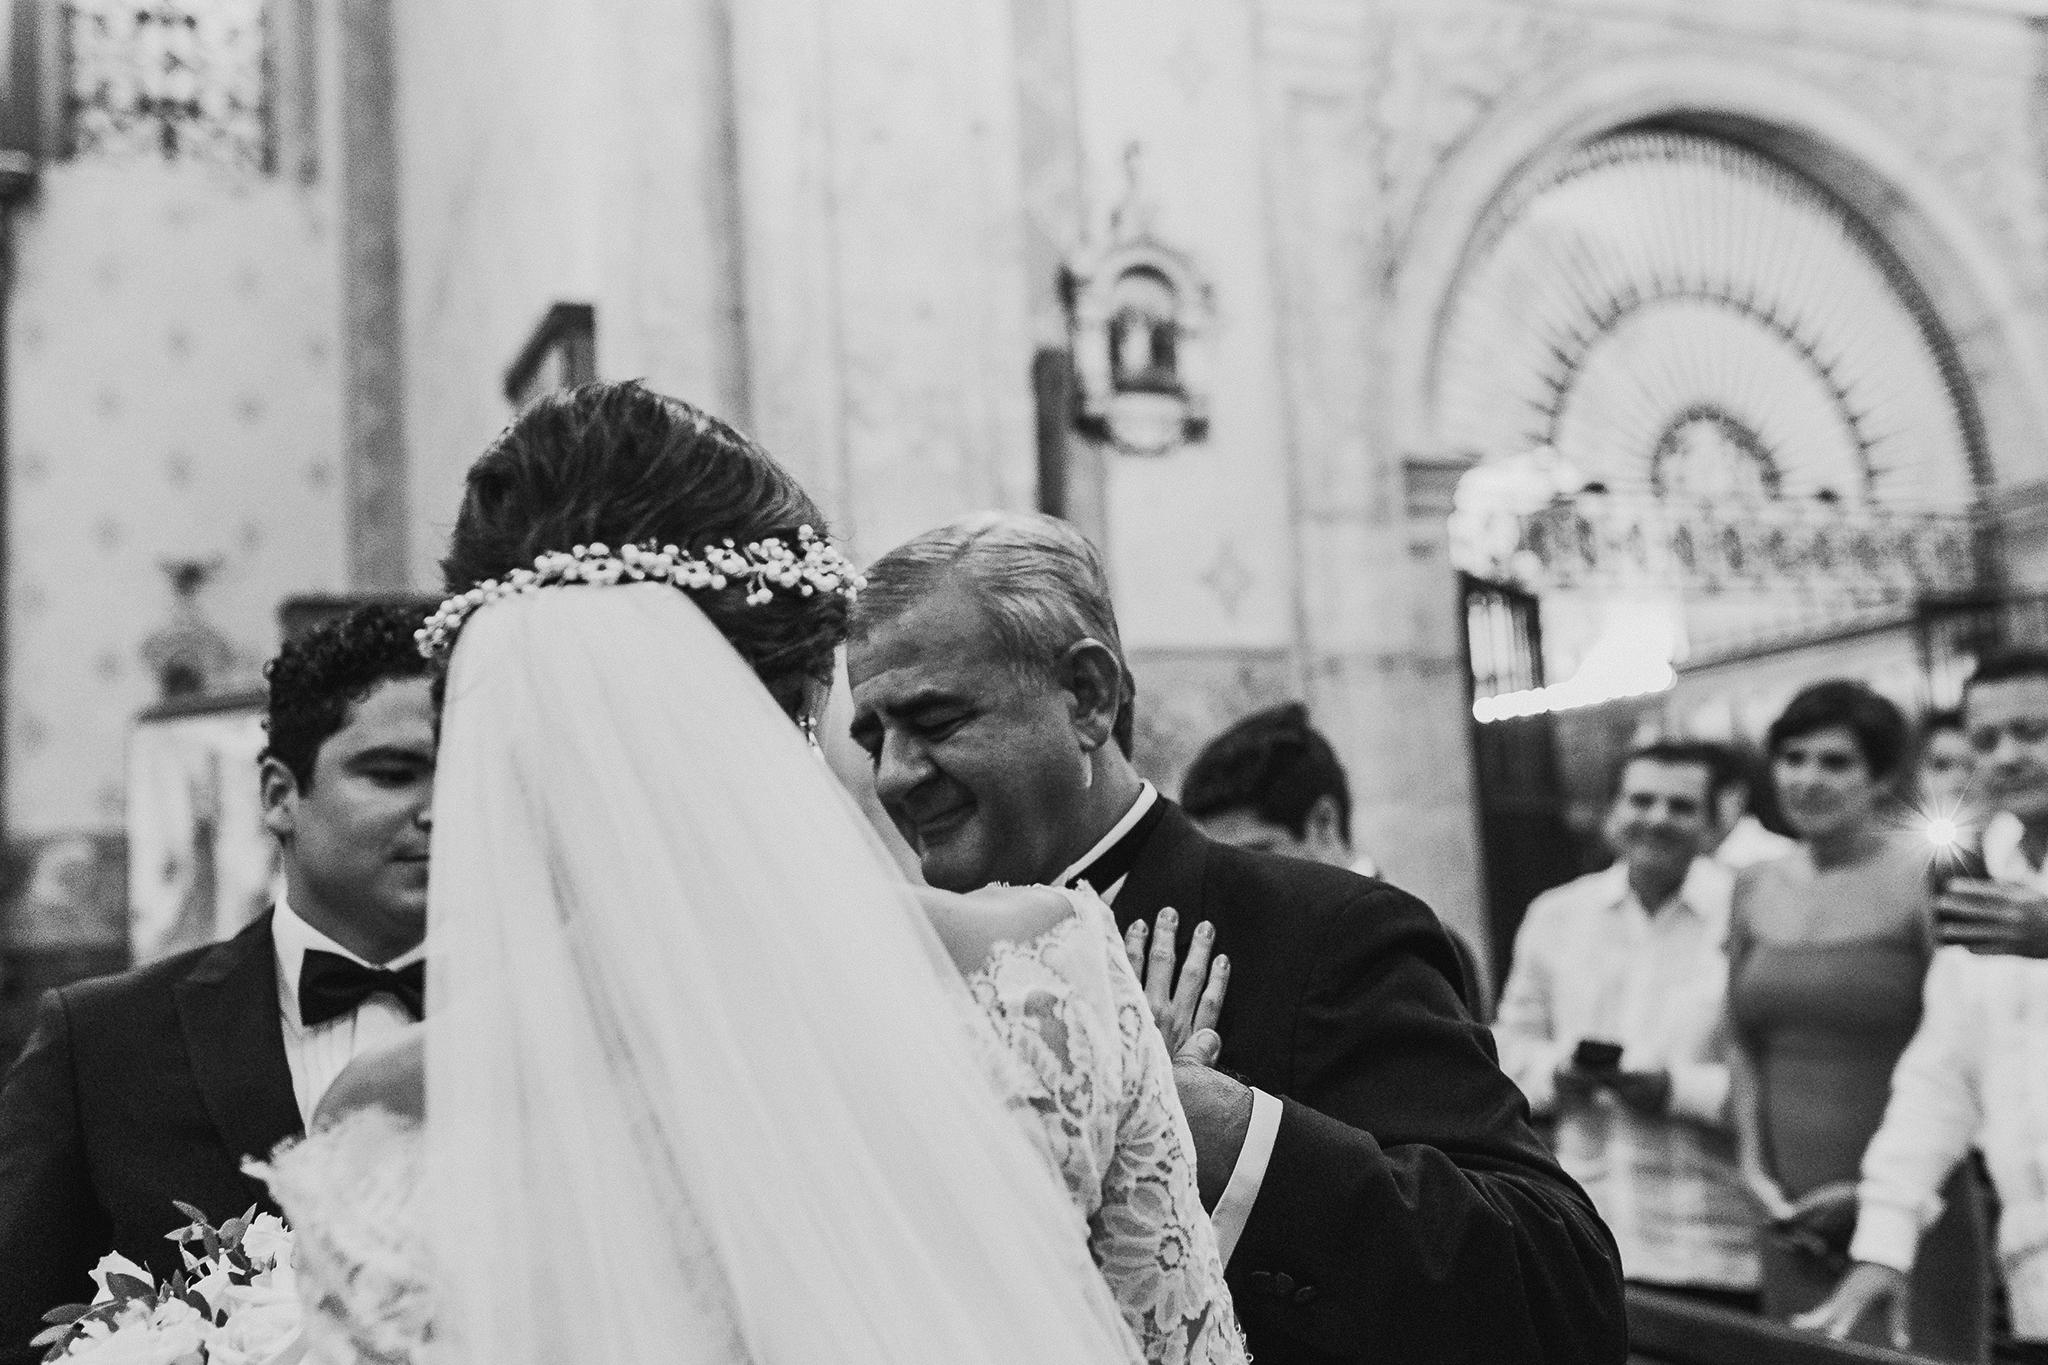 0228F&Yslide_WeddingDstination_MeridaYucatan_HaciendasMerida_BodasMexico_BodasYucatan_Boda_Destino.jpg